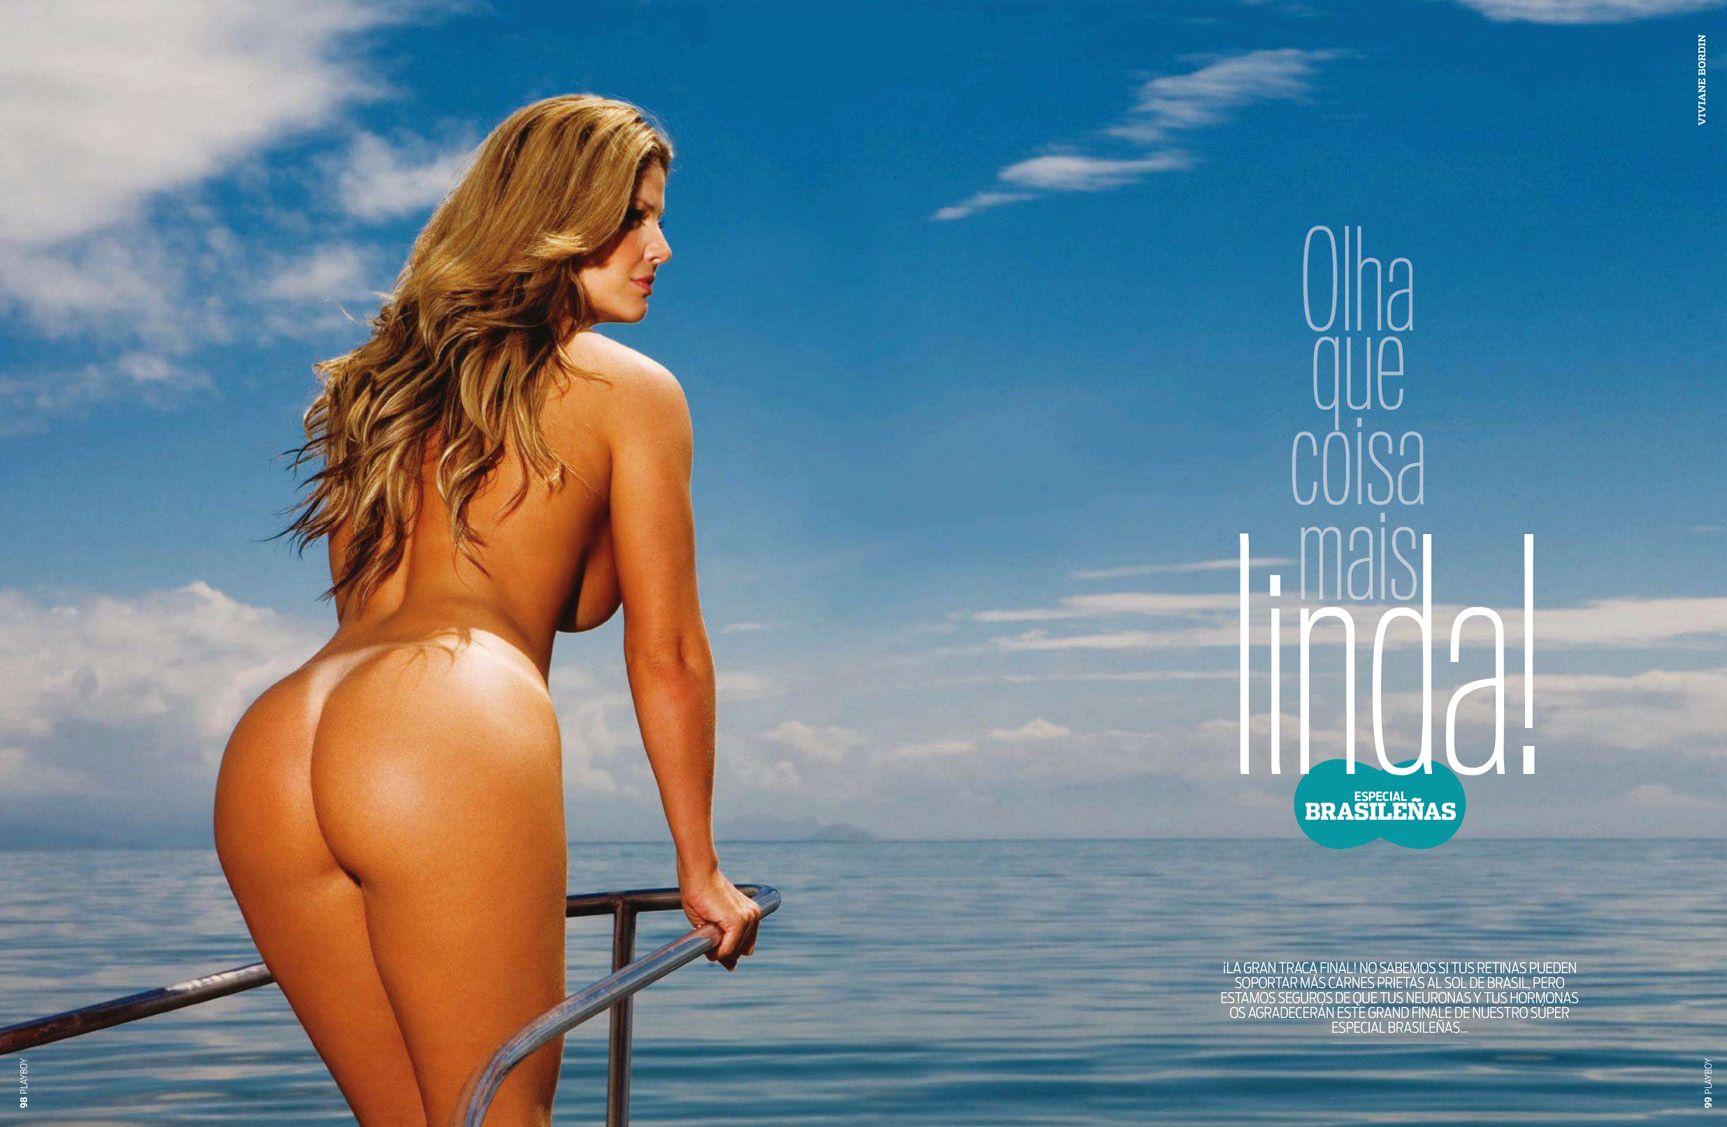 бразильские девушки / Especial Brasilenas in Playboy Spain january 2011 - Viviane Bordin